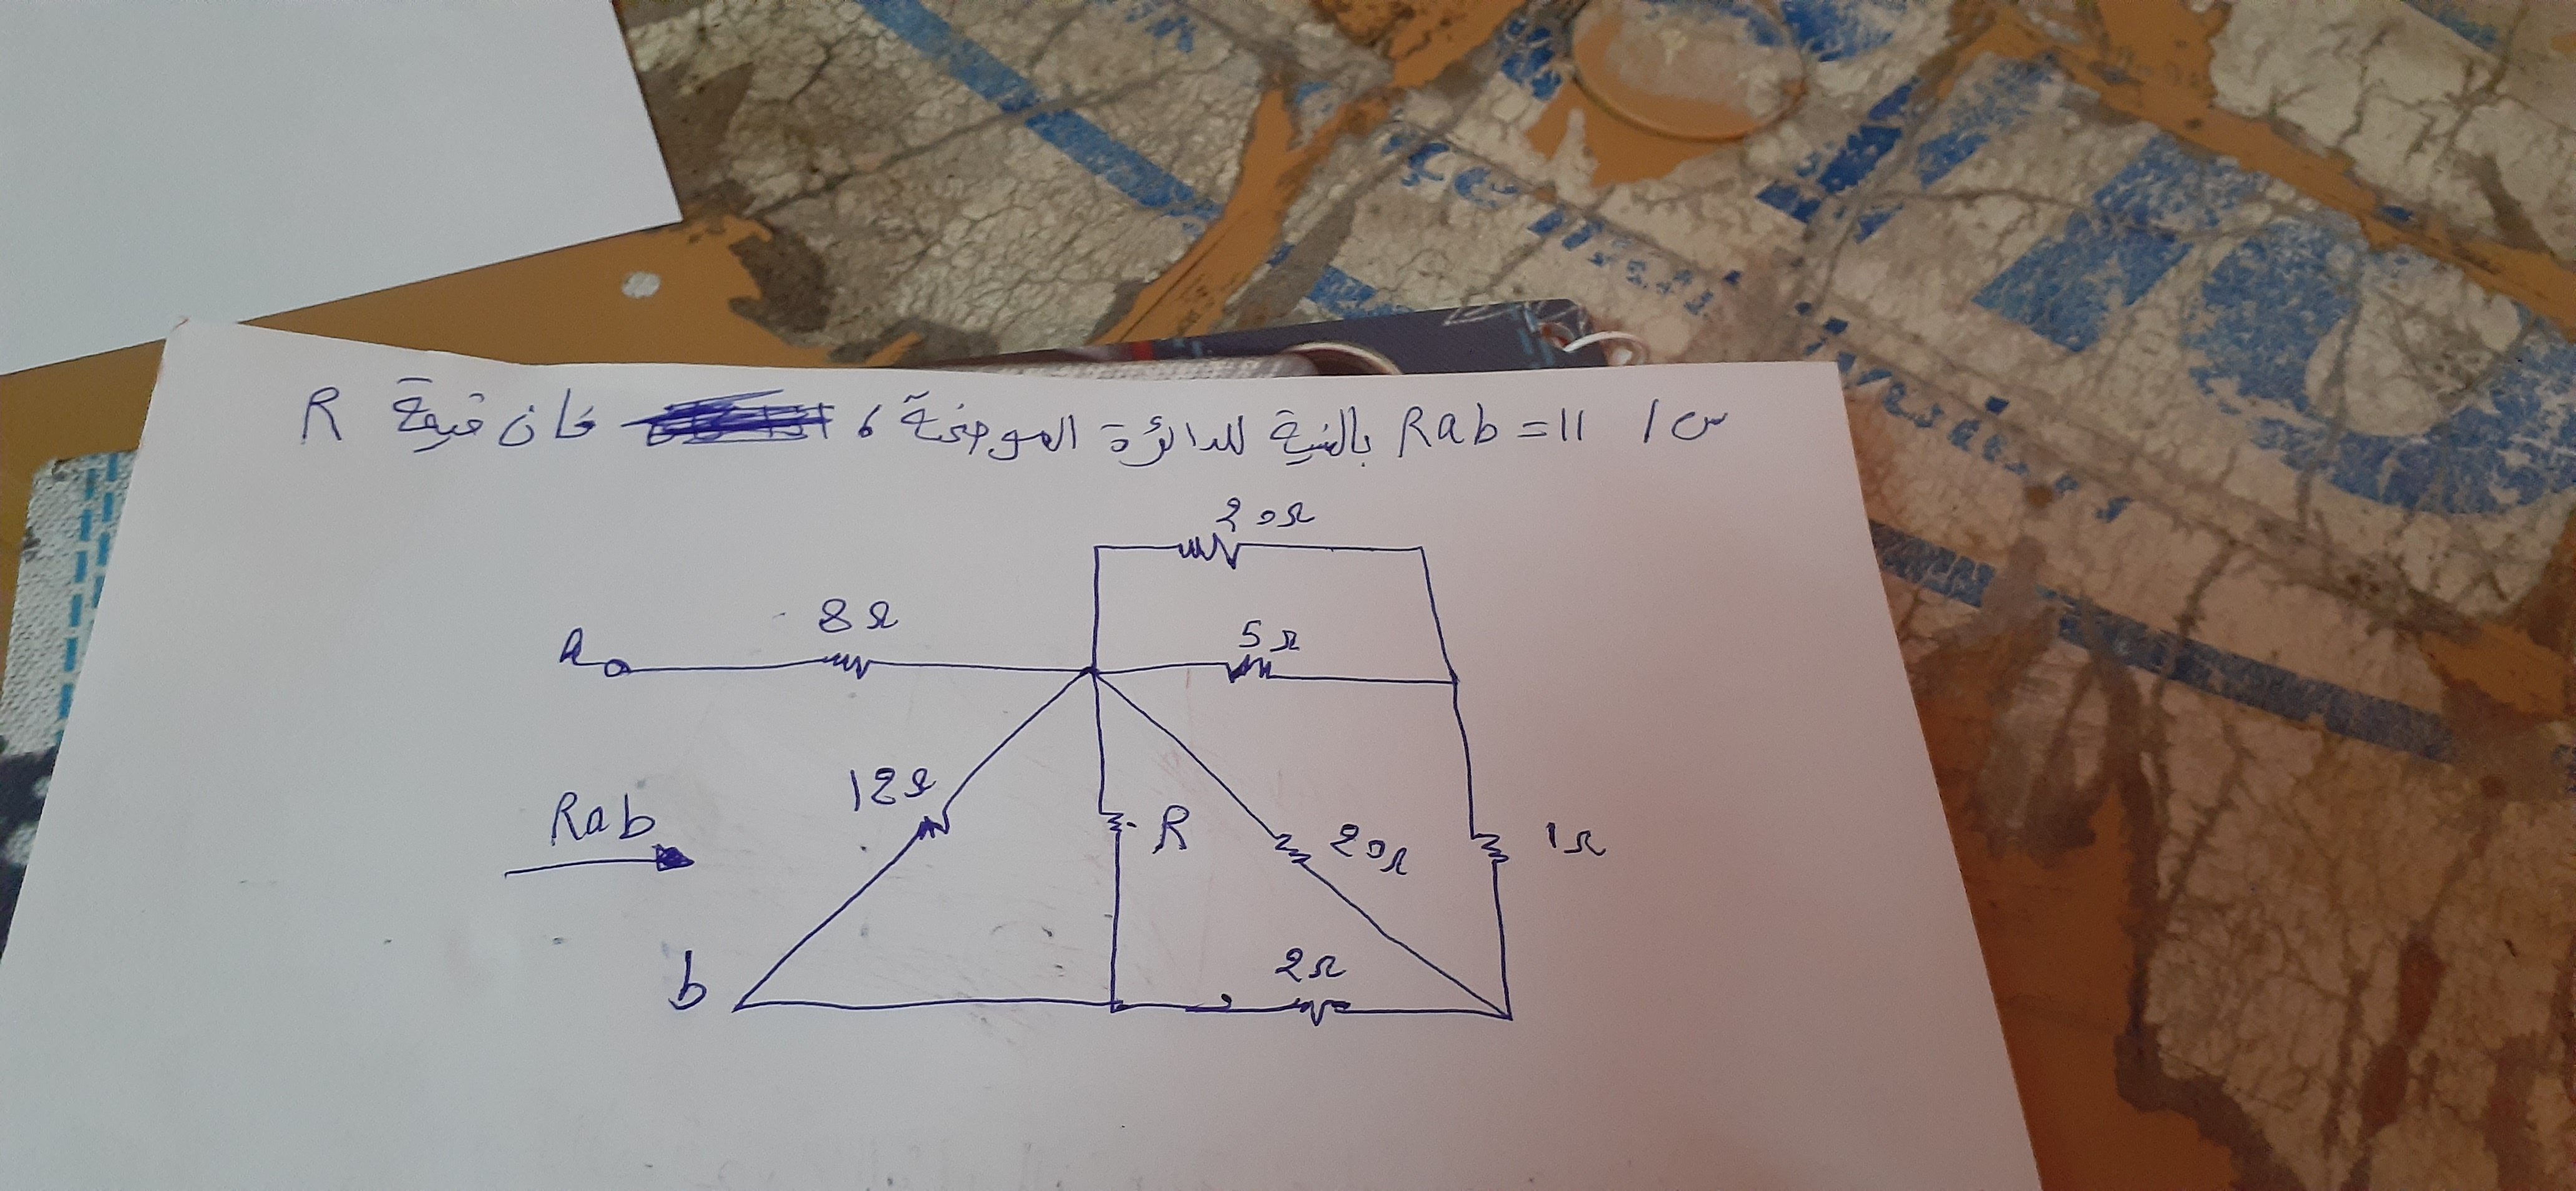 R Ziob Espqっかを Rab=11 1cr 82 20人 Rab